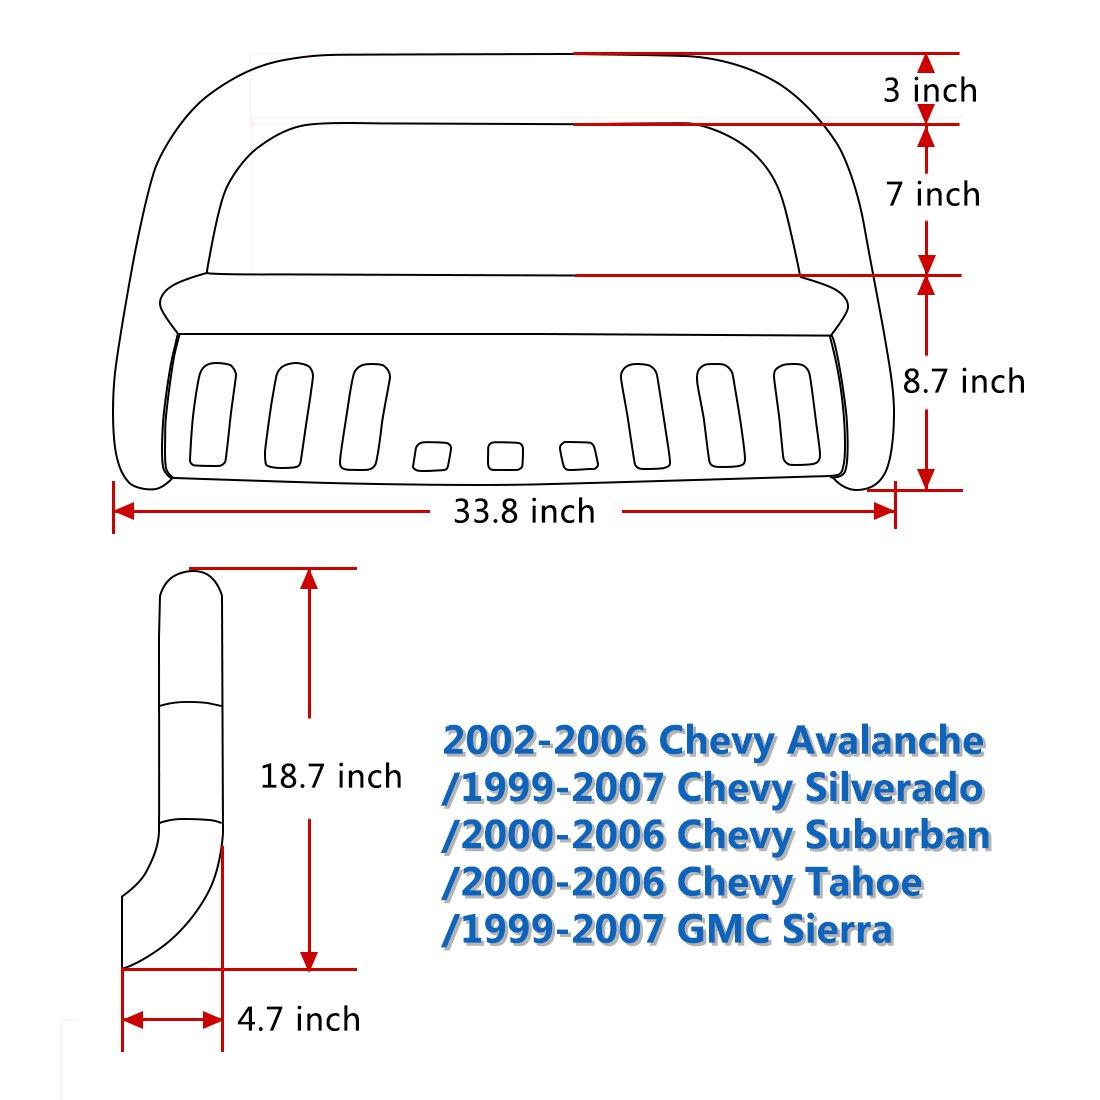 Chrome B07BQSPWP6 Chrome 02-06 Chevy Avalanche 1500 3 Grill Brush Push Guard AUTOSAVER88 Bull Bar Compatible for 99-07 Chevy Silverado 1500 // GMC Sierra 1500 02-06 Chevy Avalanche 1500 3 Grill Brush Push Guard 00-06 Chevy Suburban 1500// Chevy Tahoe